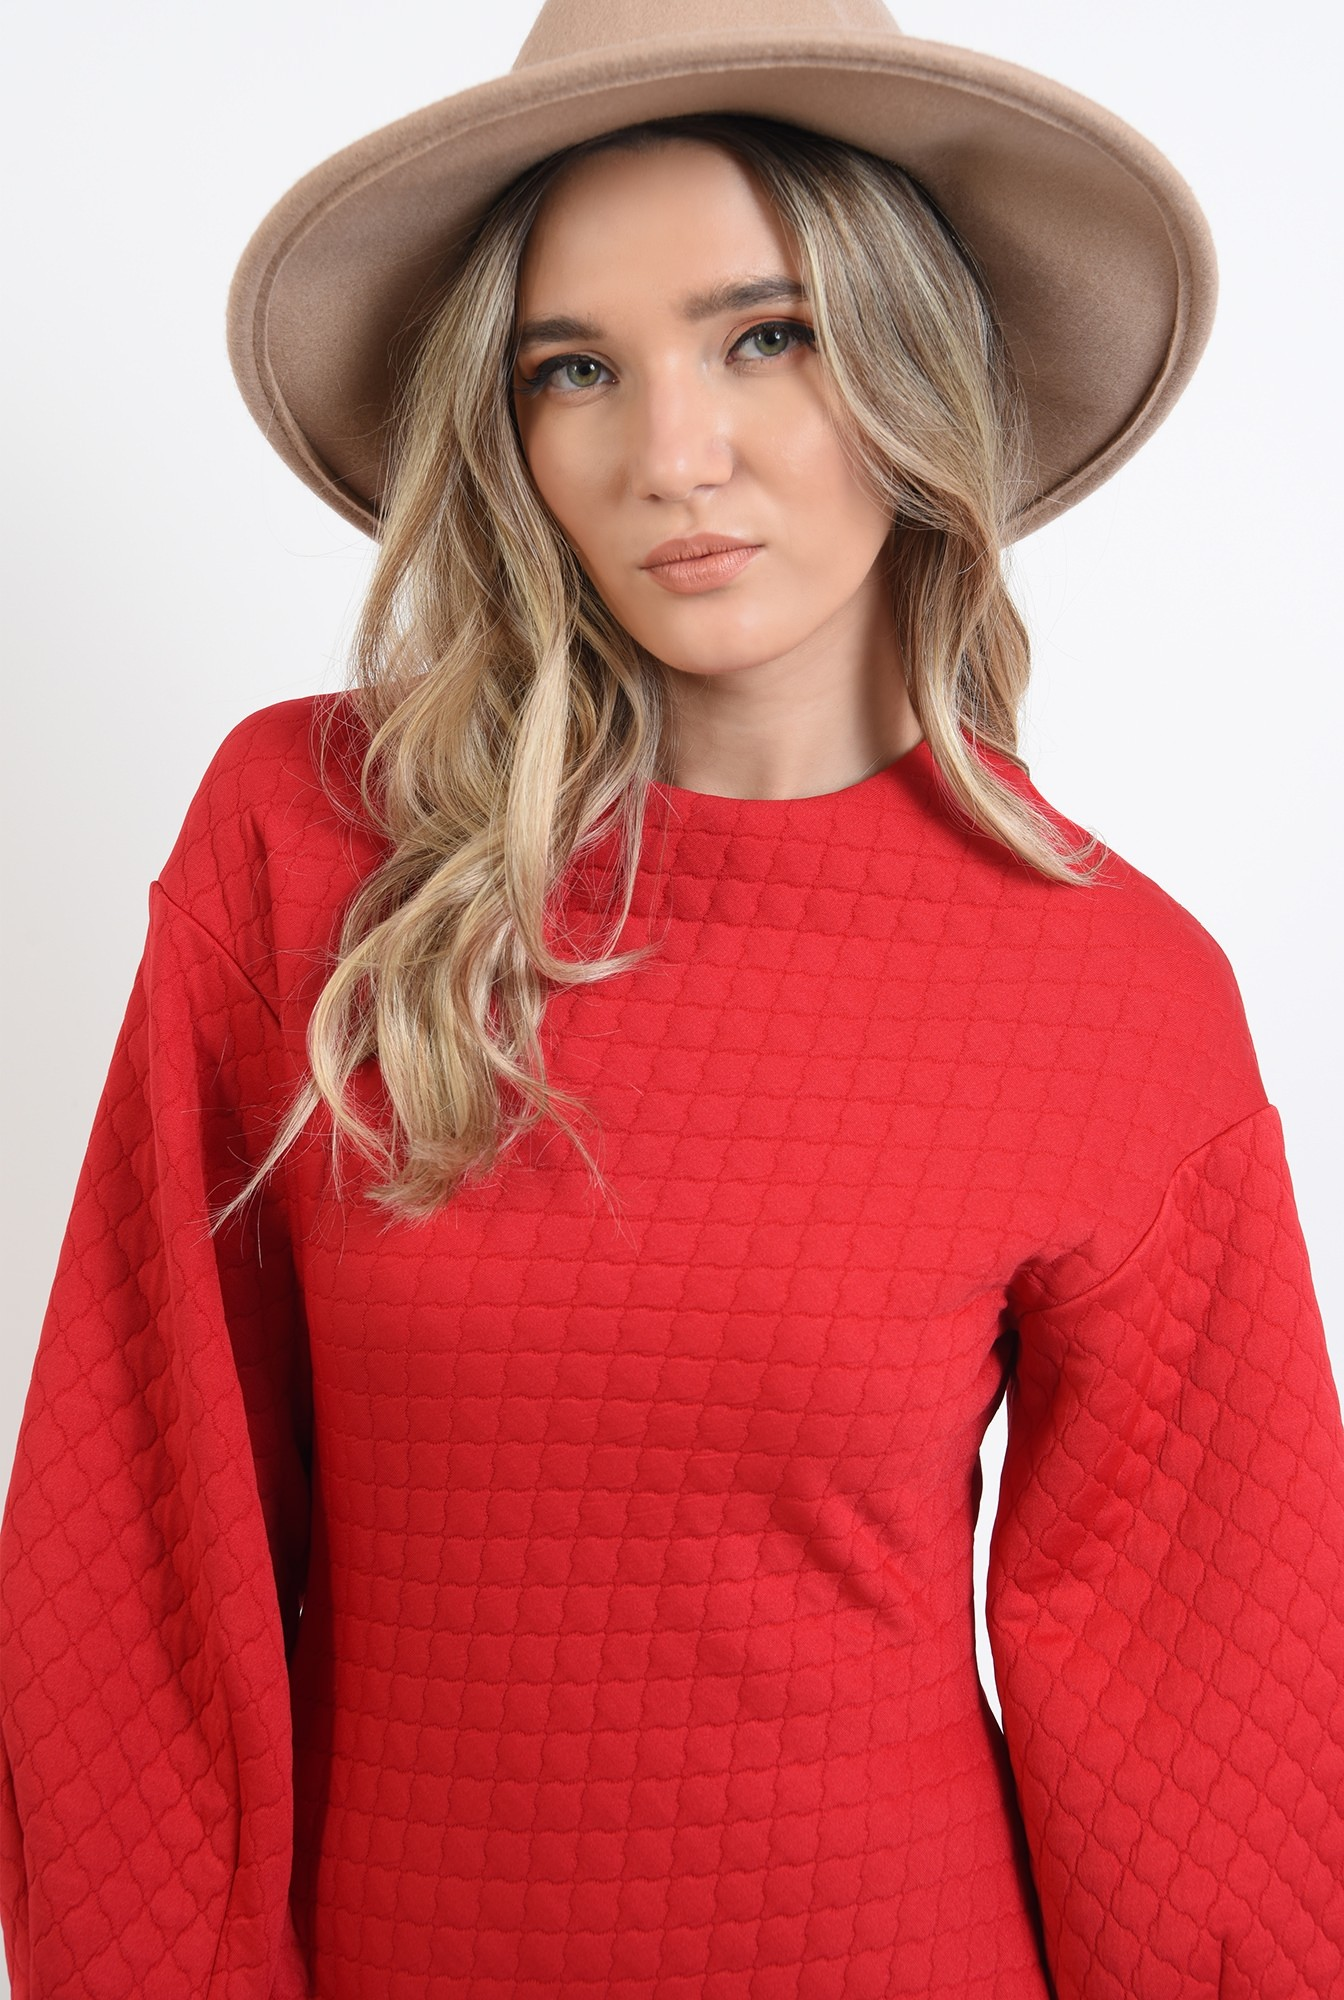 2 - 360 - rochie cu maneci largi, rosie, mini